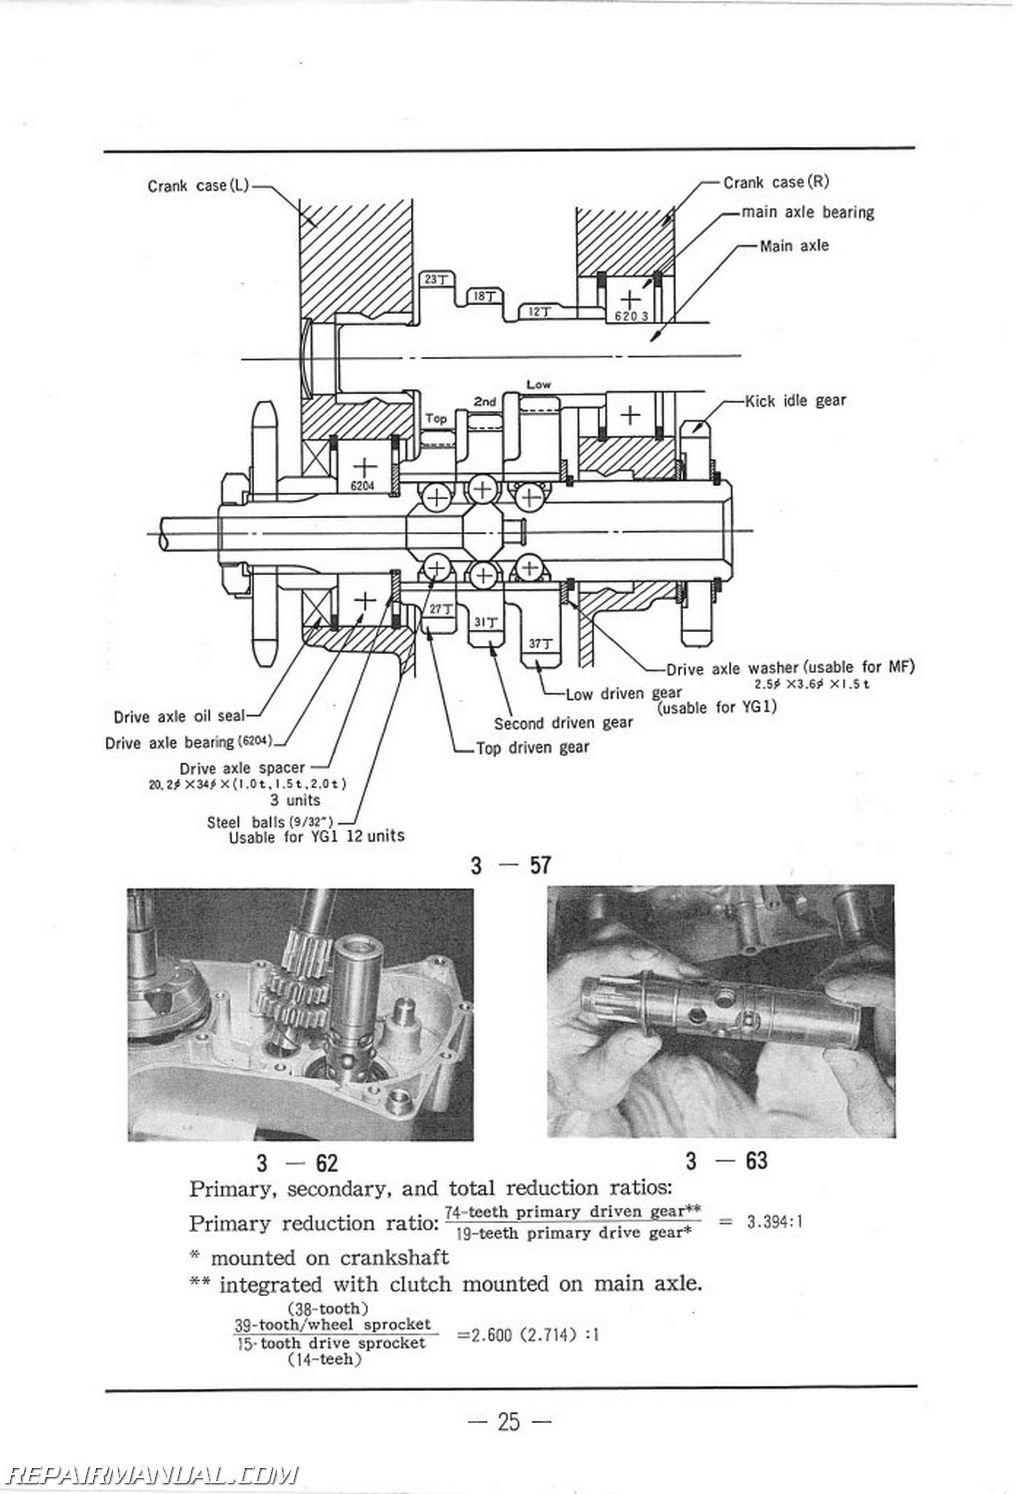 1966 Yamaha 50 Service Manual